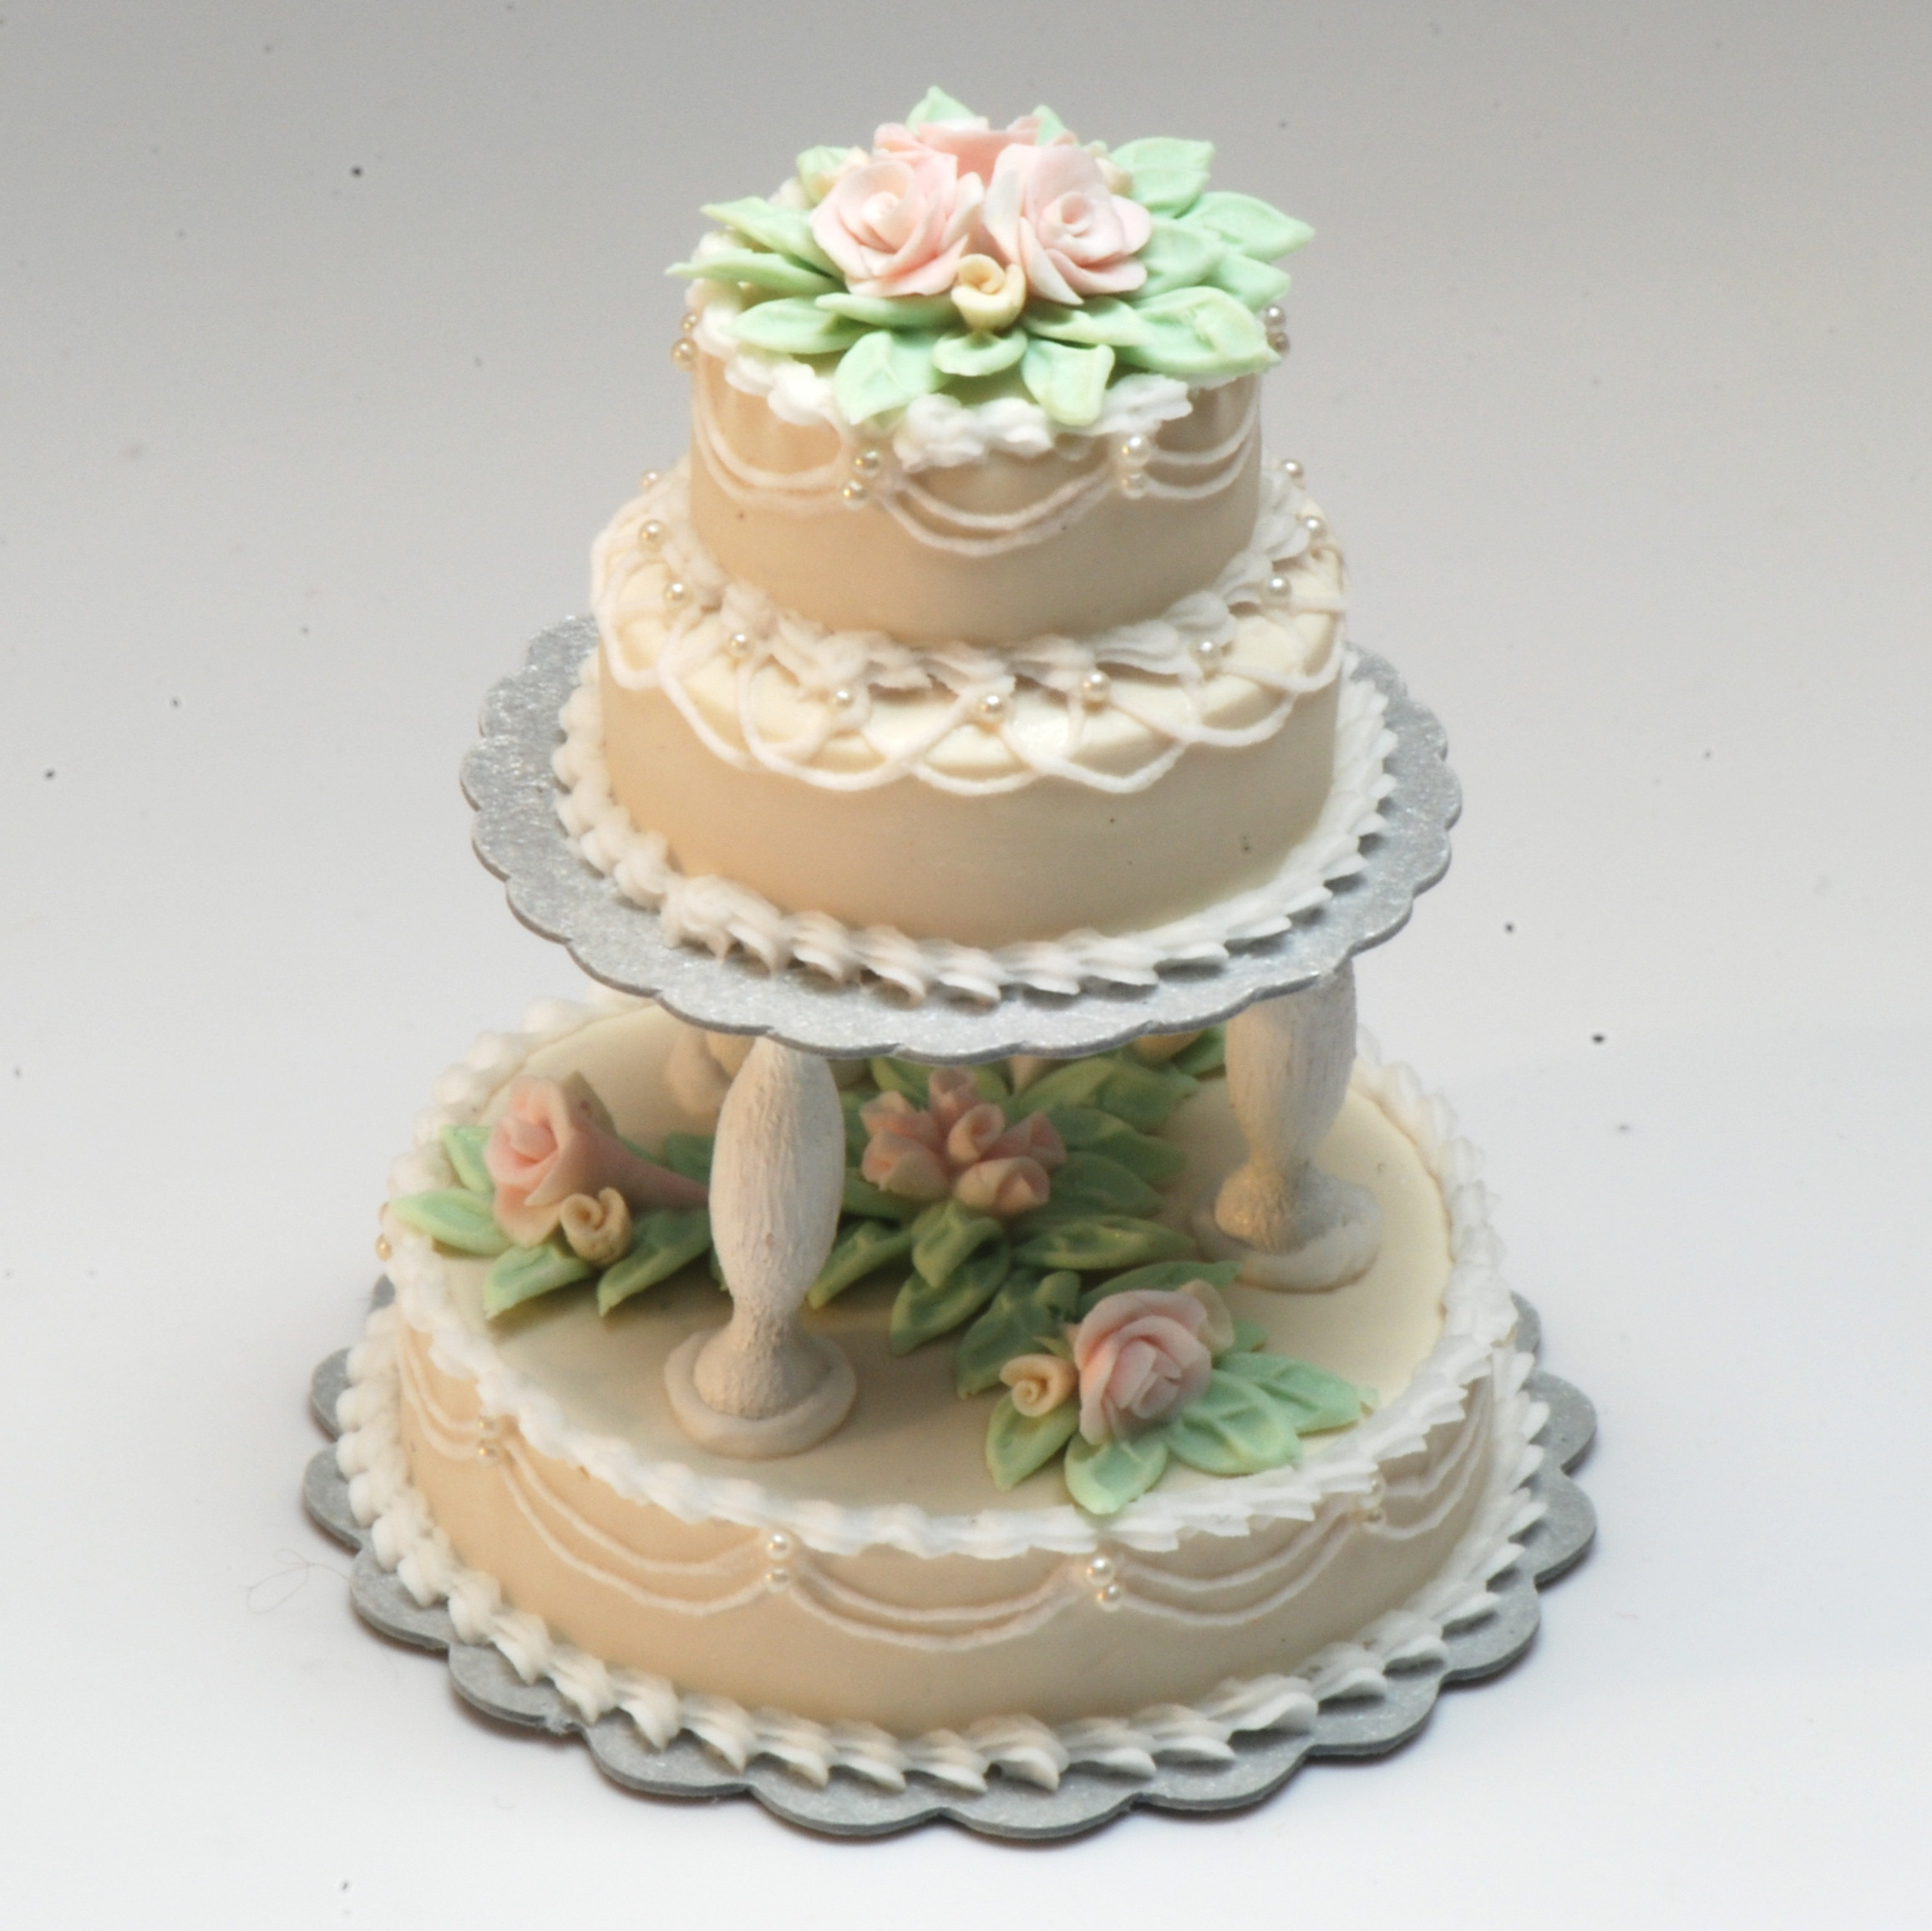 Walmart 3 Tier Wedding Cakes  Tier Walmart Wedding Cake Ideas and Designs